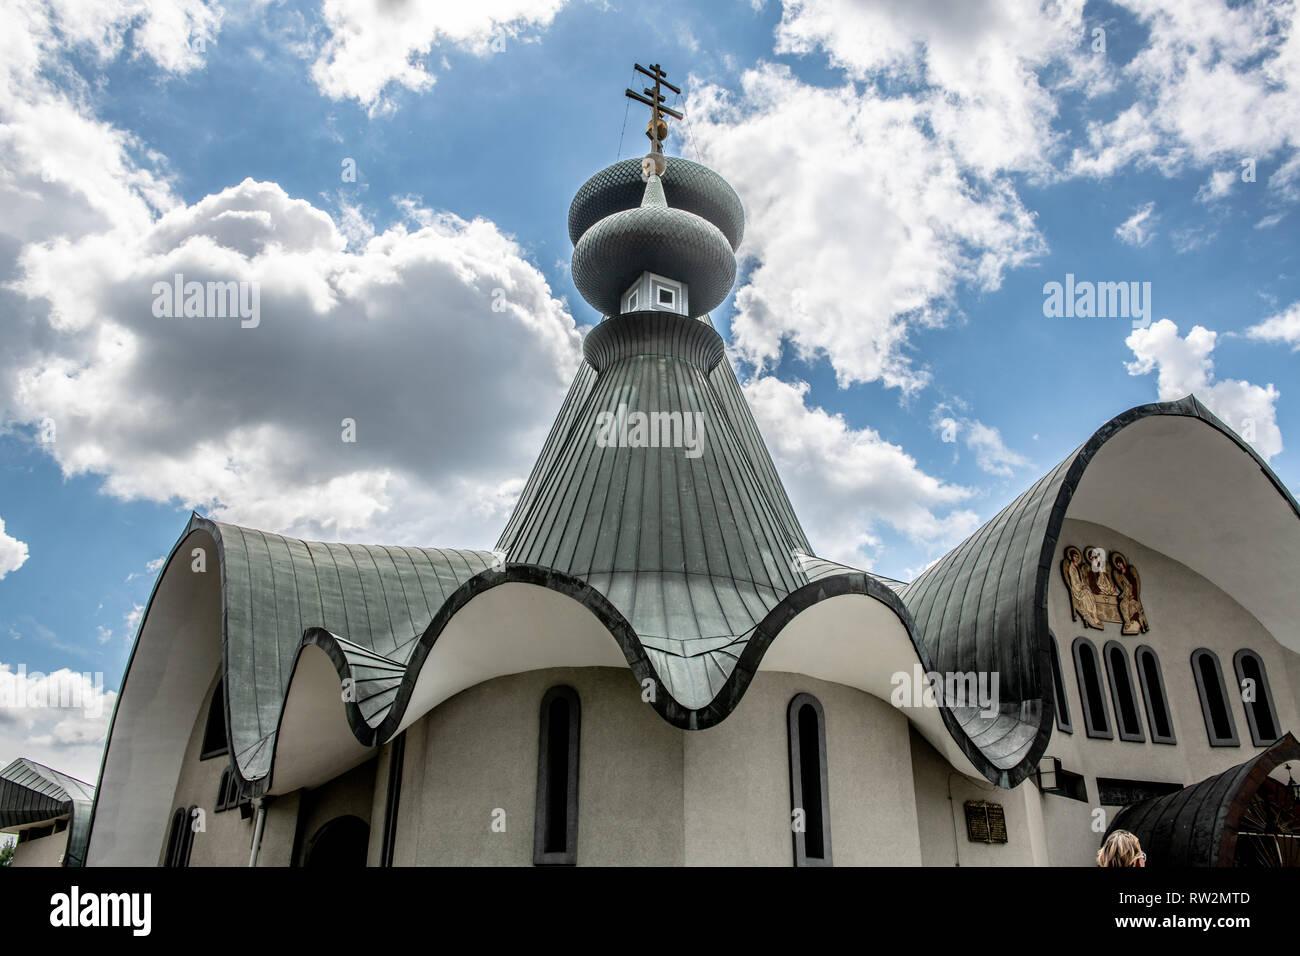 Wavy roof and spire on top of Sabor Sviatoj Trojcy, Orthodox church,  Hajnówka Poland. - Stock Image